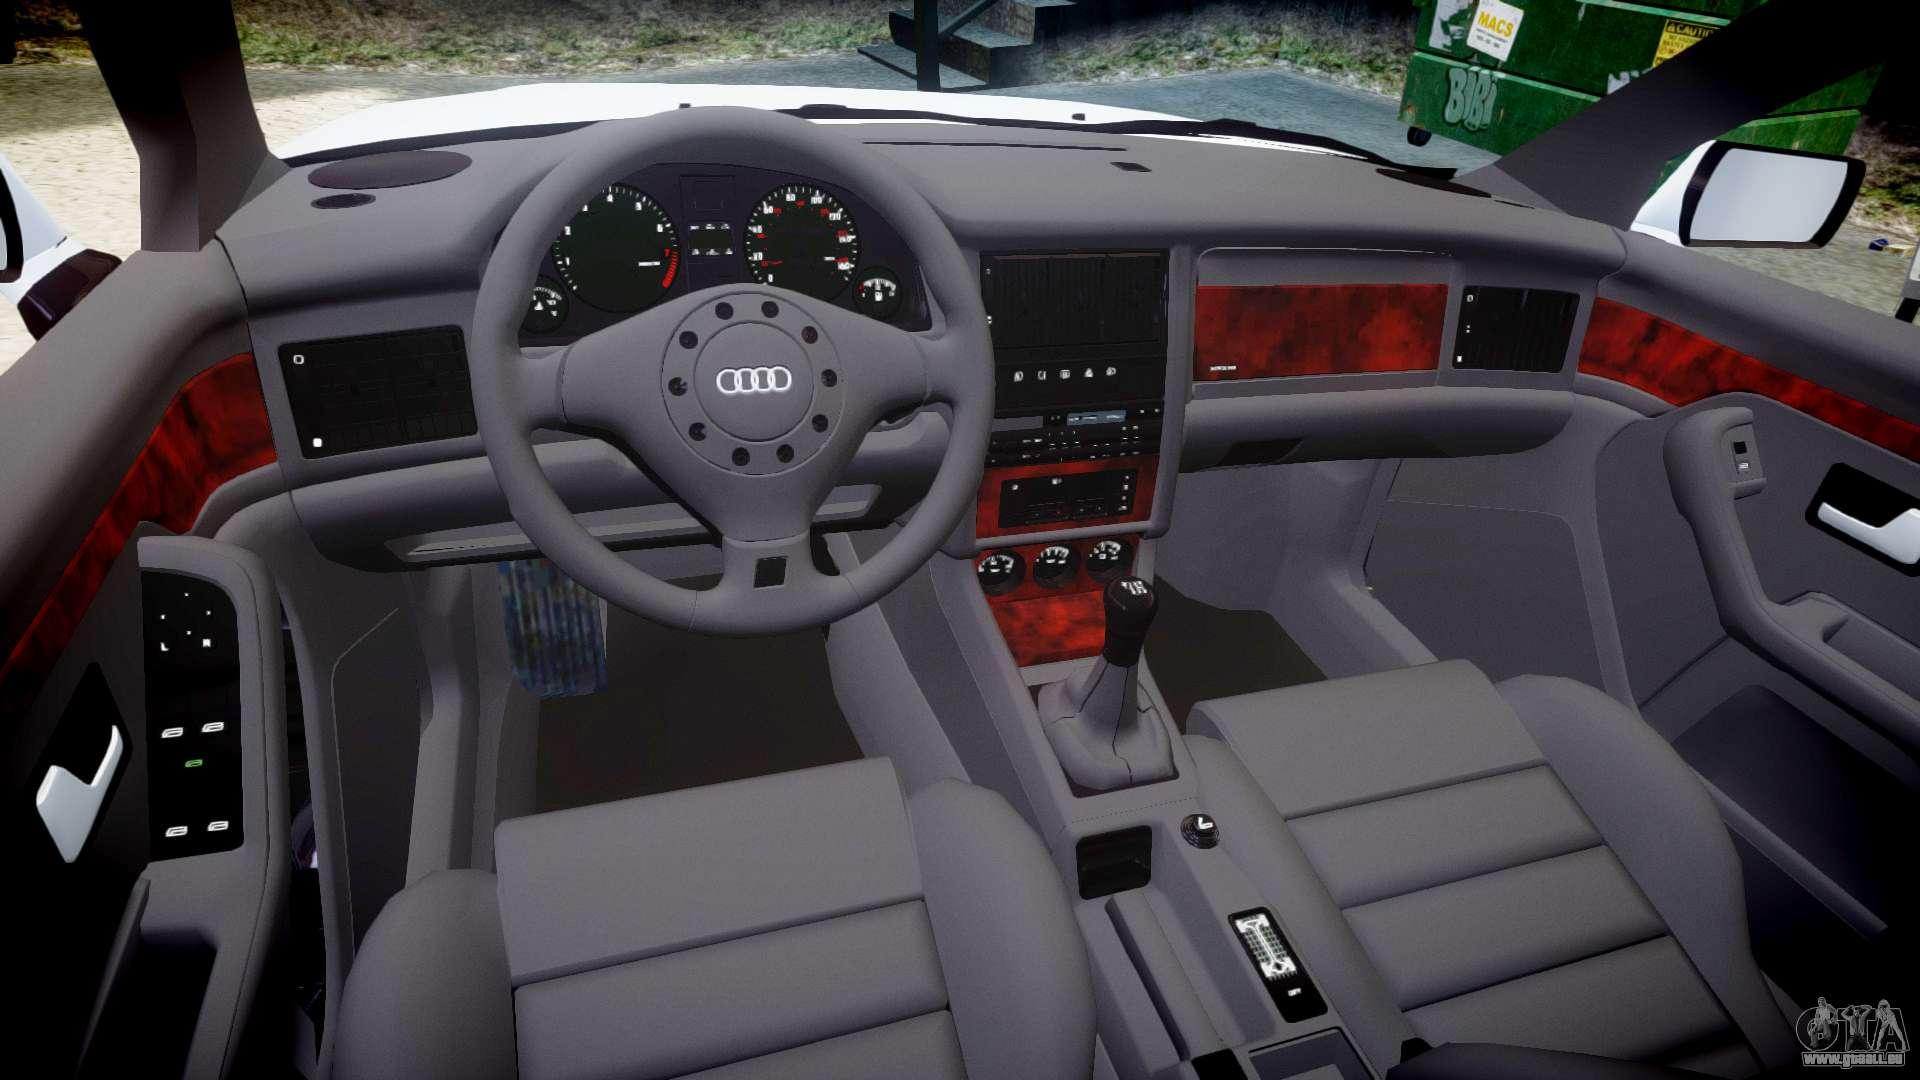 Audi 80 cabrio euro tail lights pour gta 4 for Audi 80 interieur